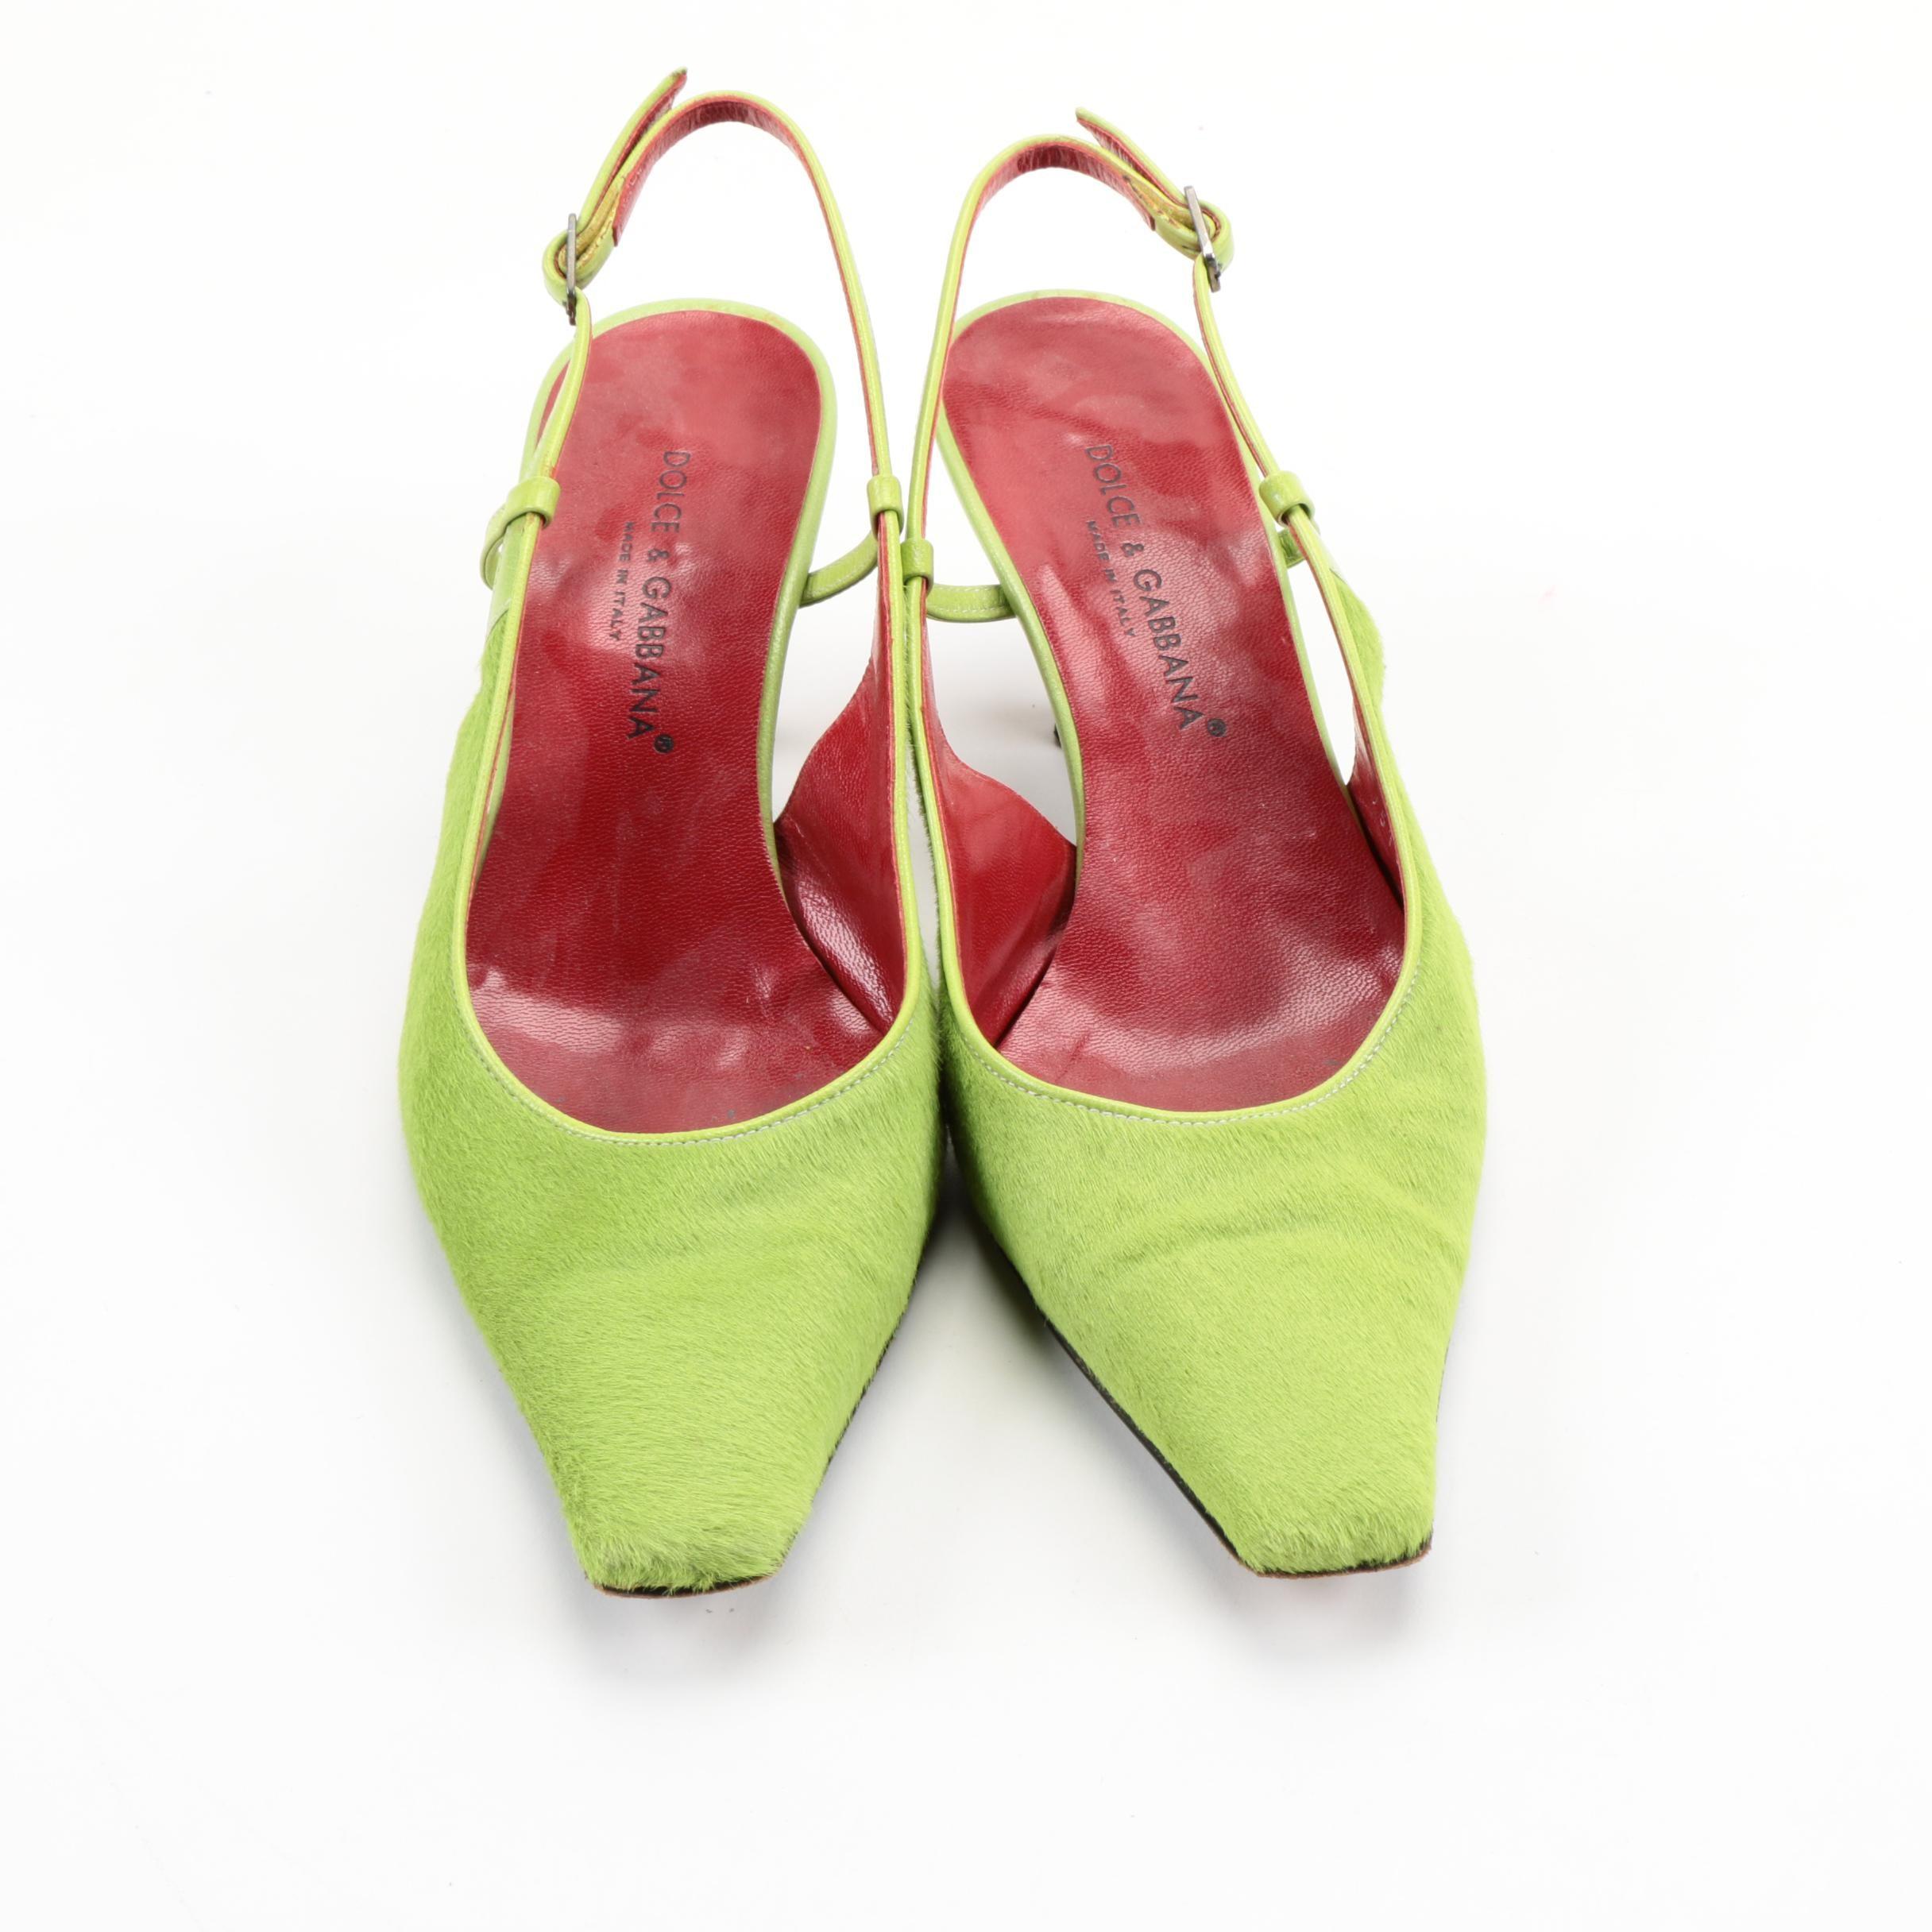 Dolce & Gabbana Pony Hair Heels